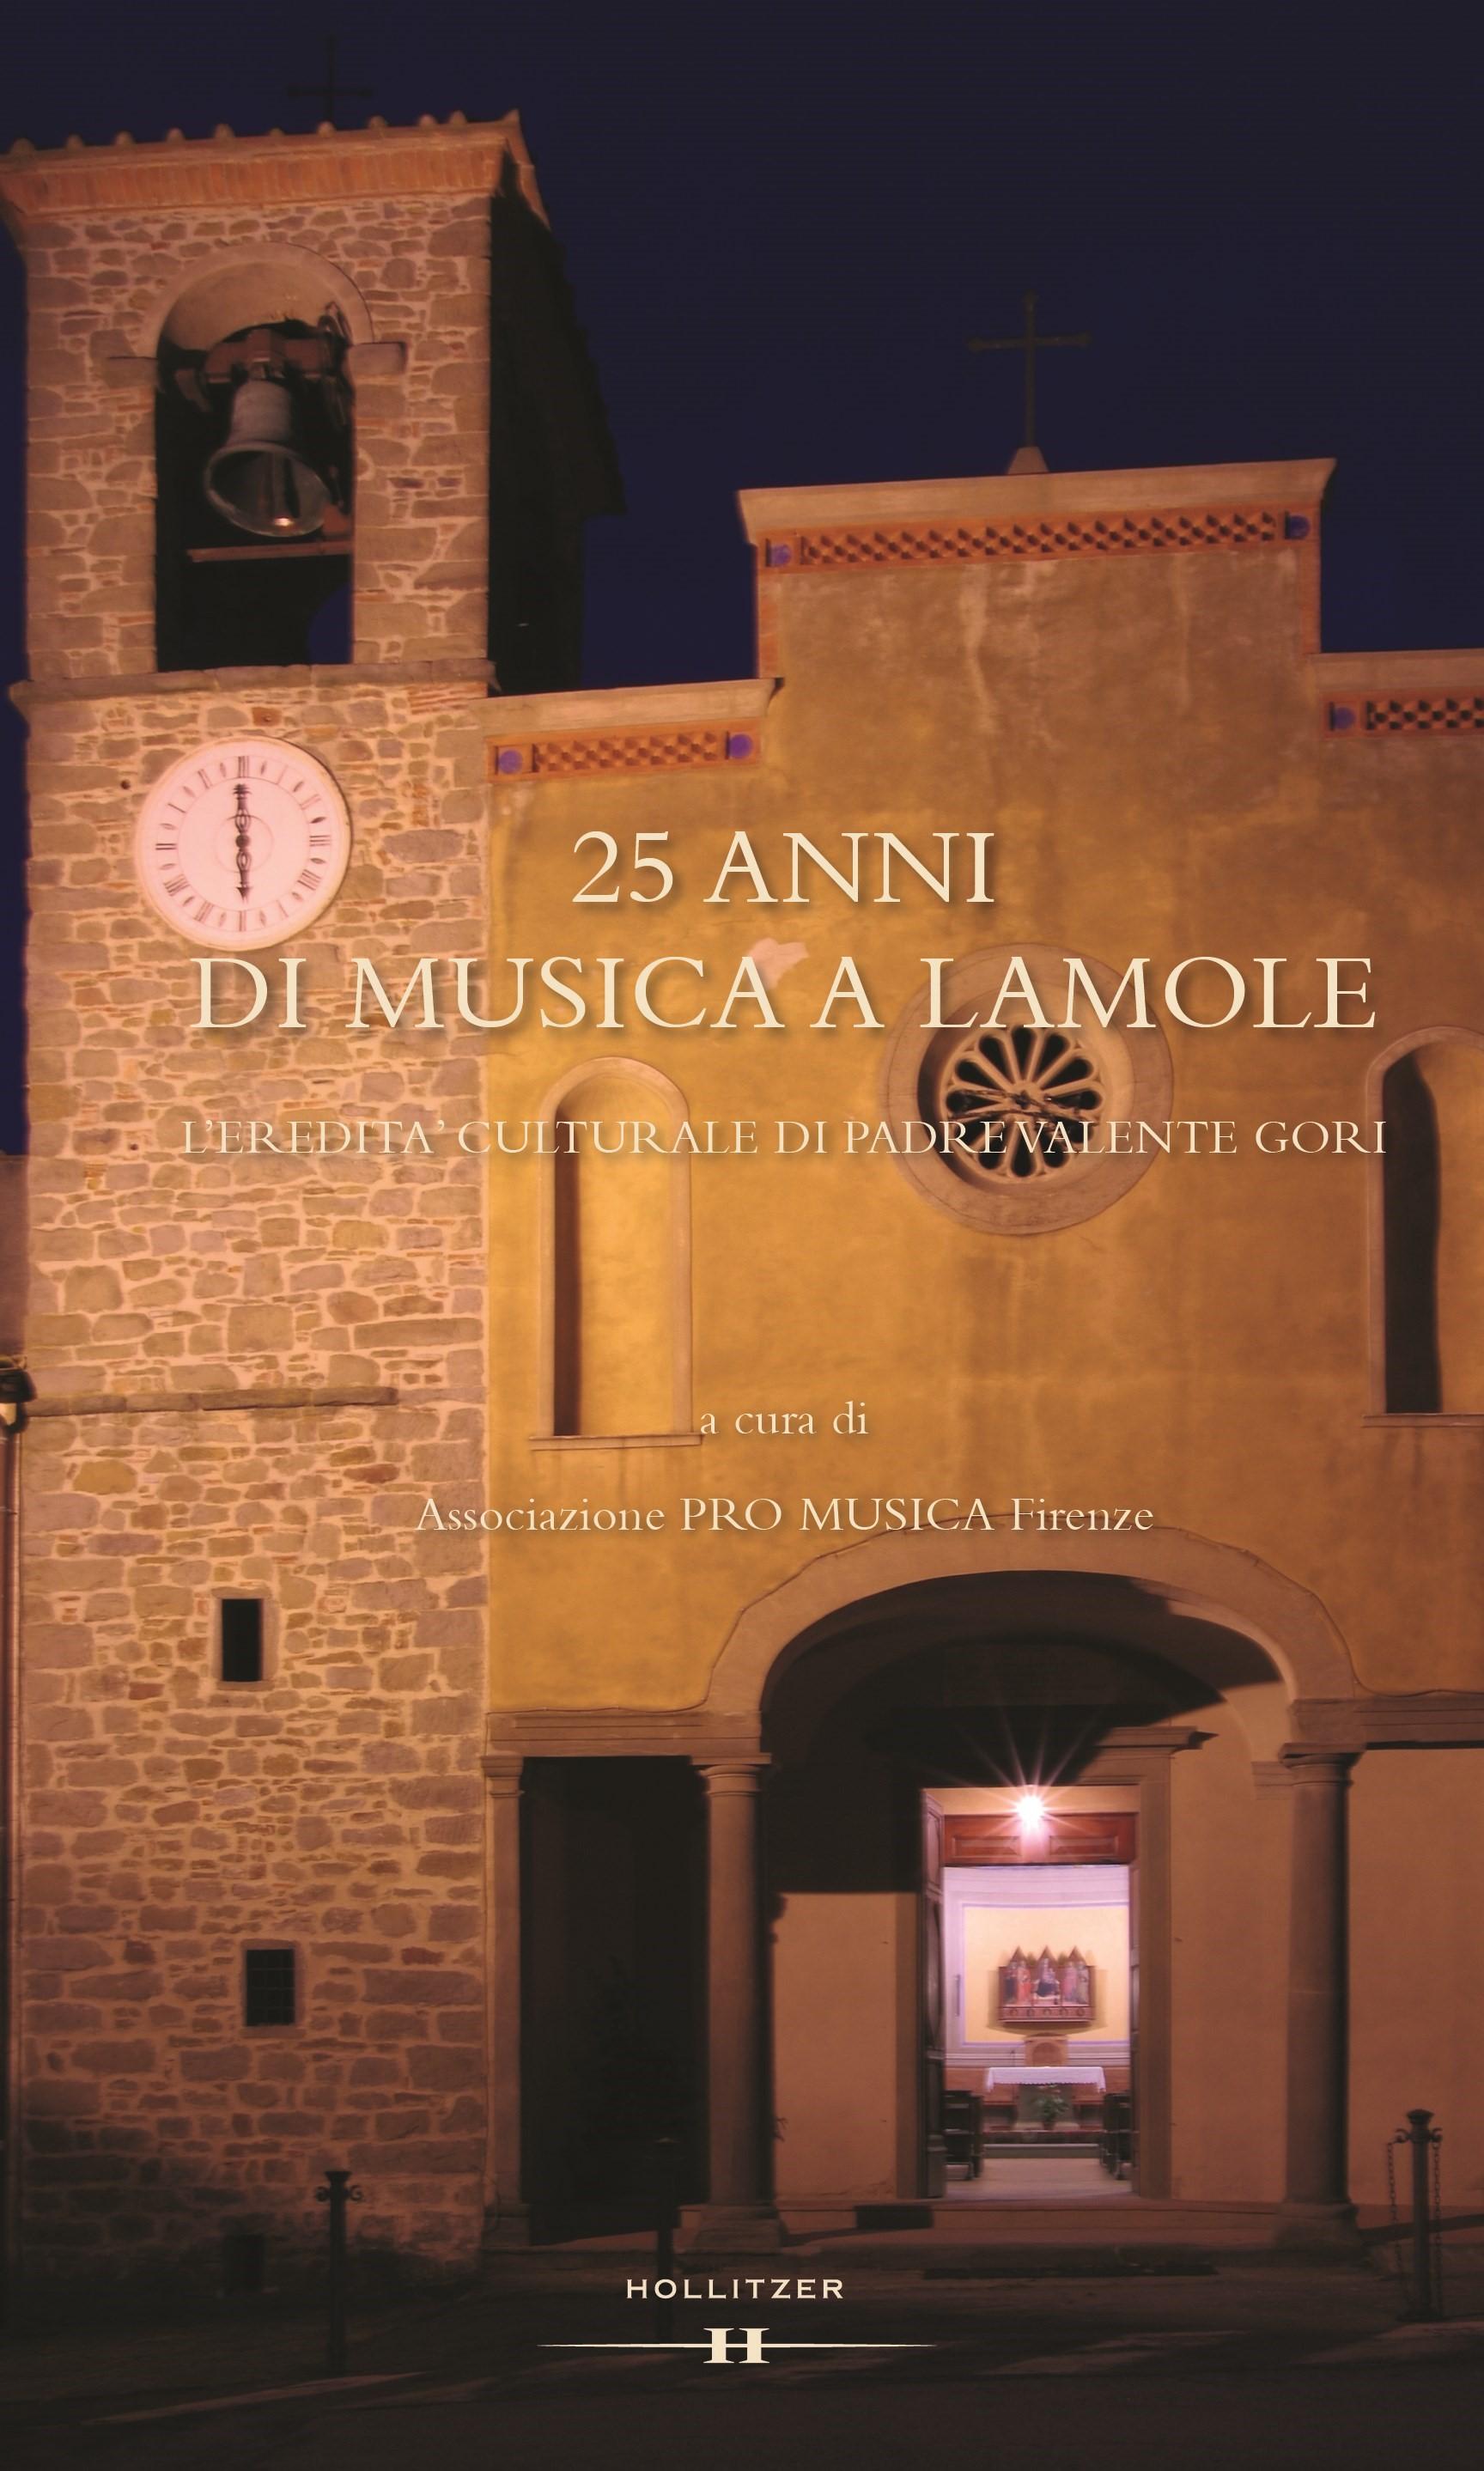 25 anni di musica a Lamole, 2015 | Buch (Cover)